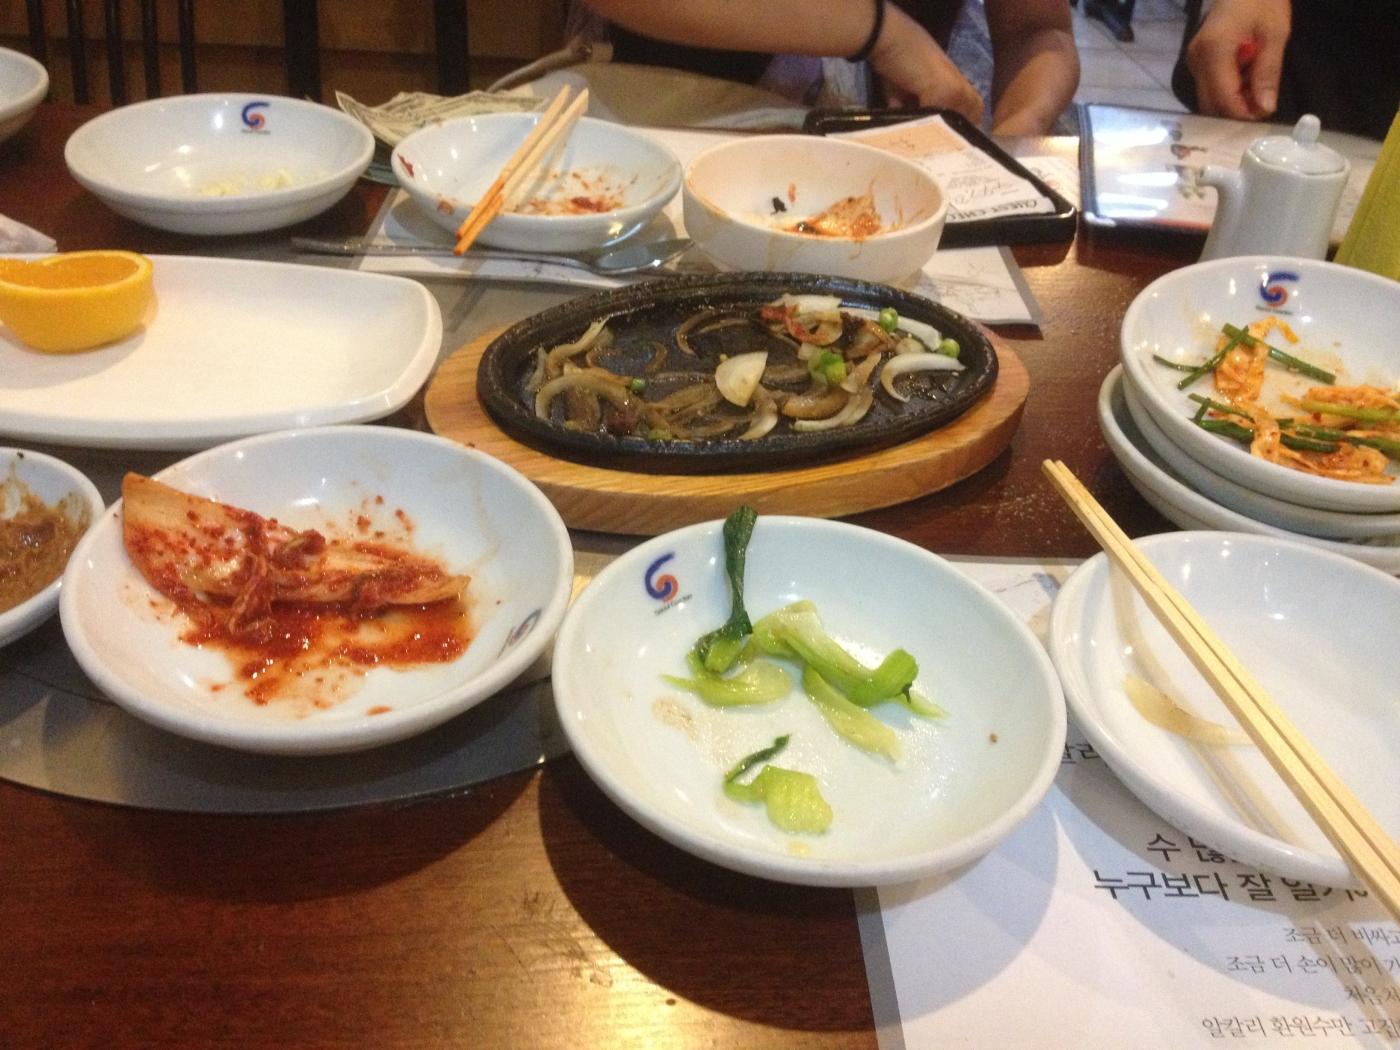 [jiejoy]星期日晚餐---首尔韩式餐_图1-10